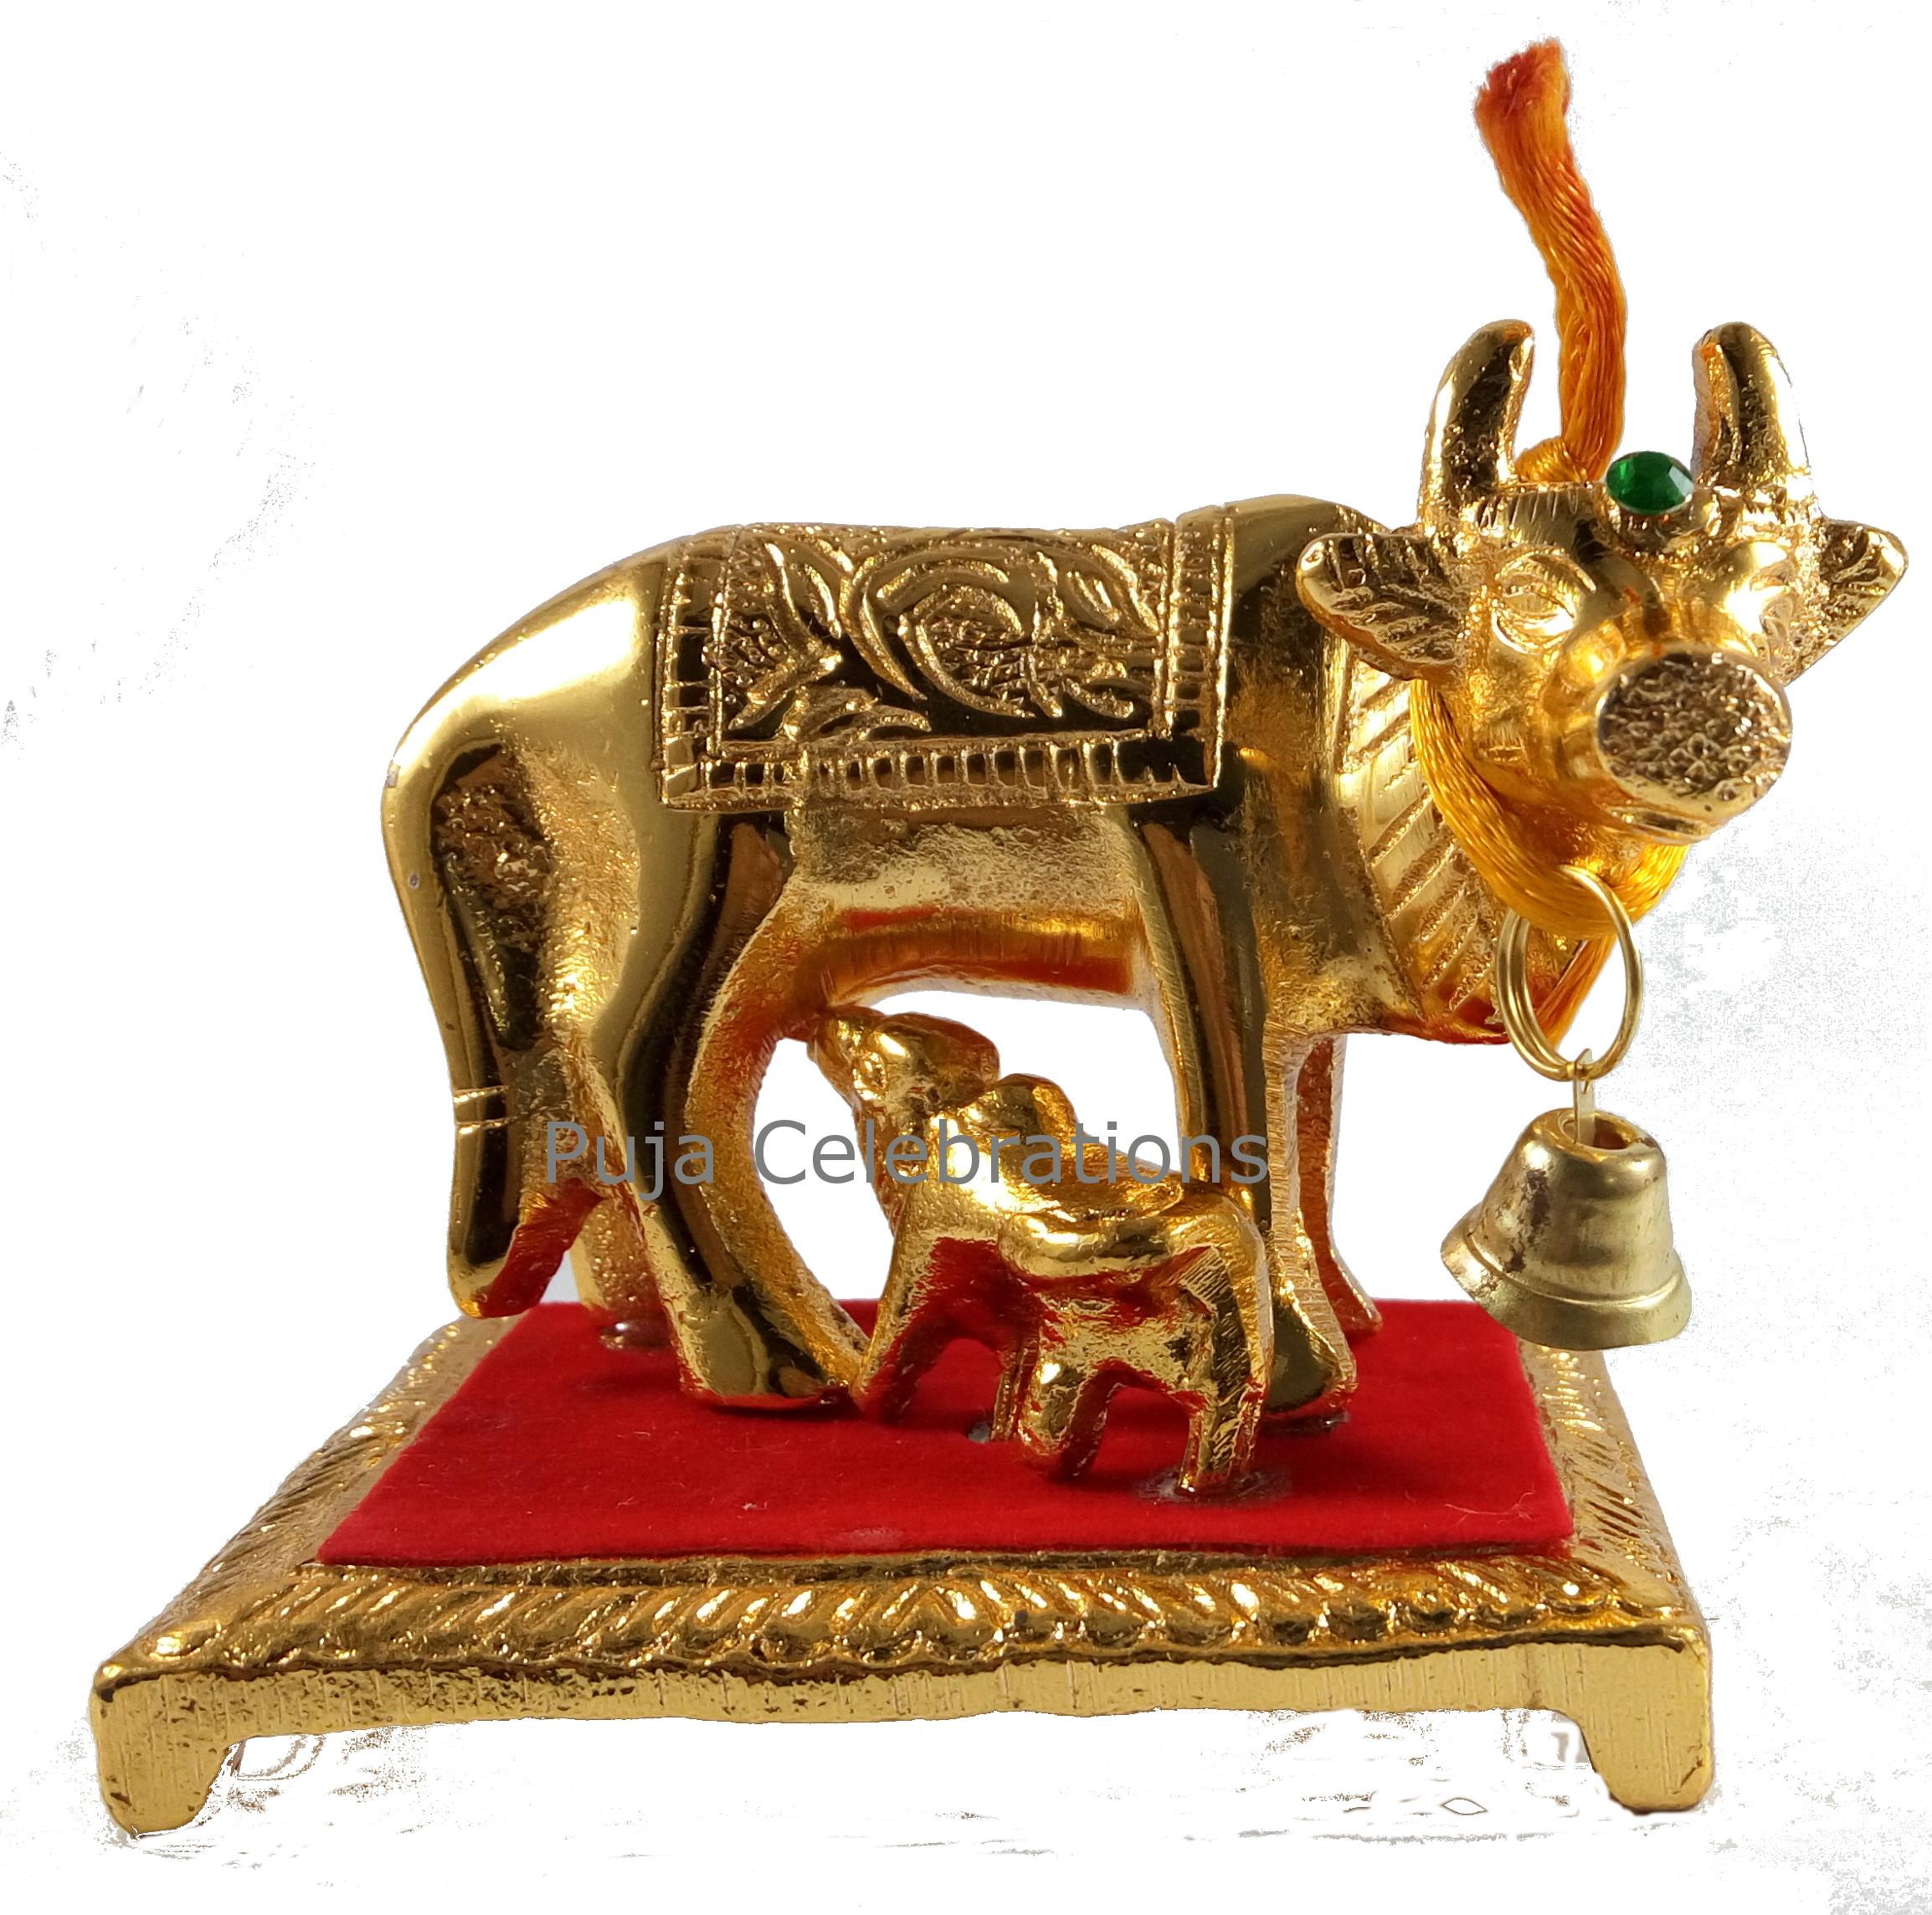 Puja Celebrations. Call Us @ 9087270009